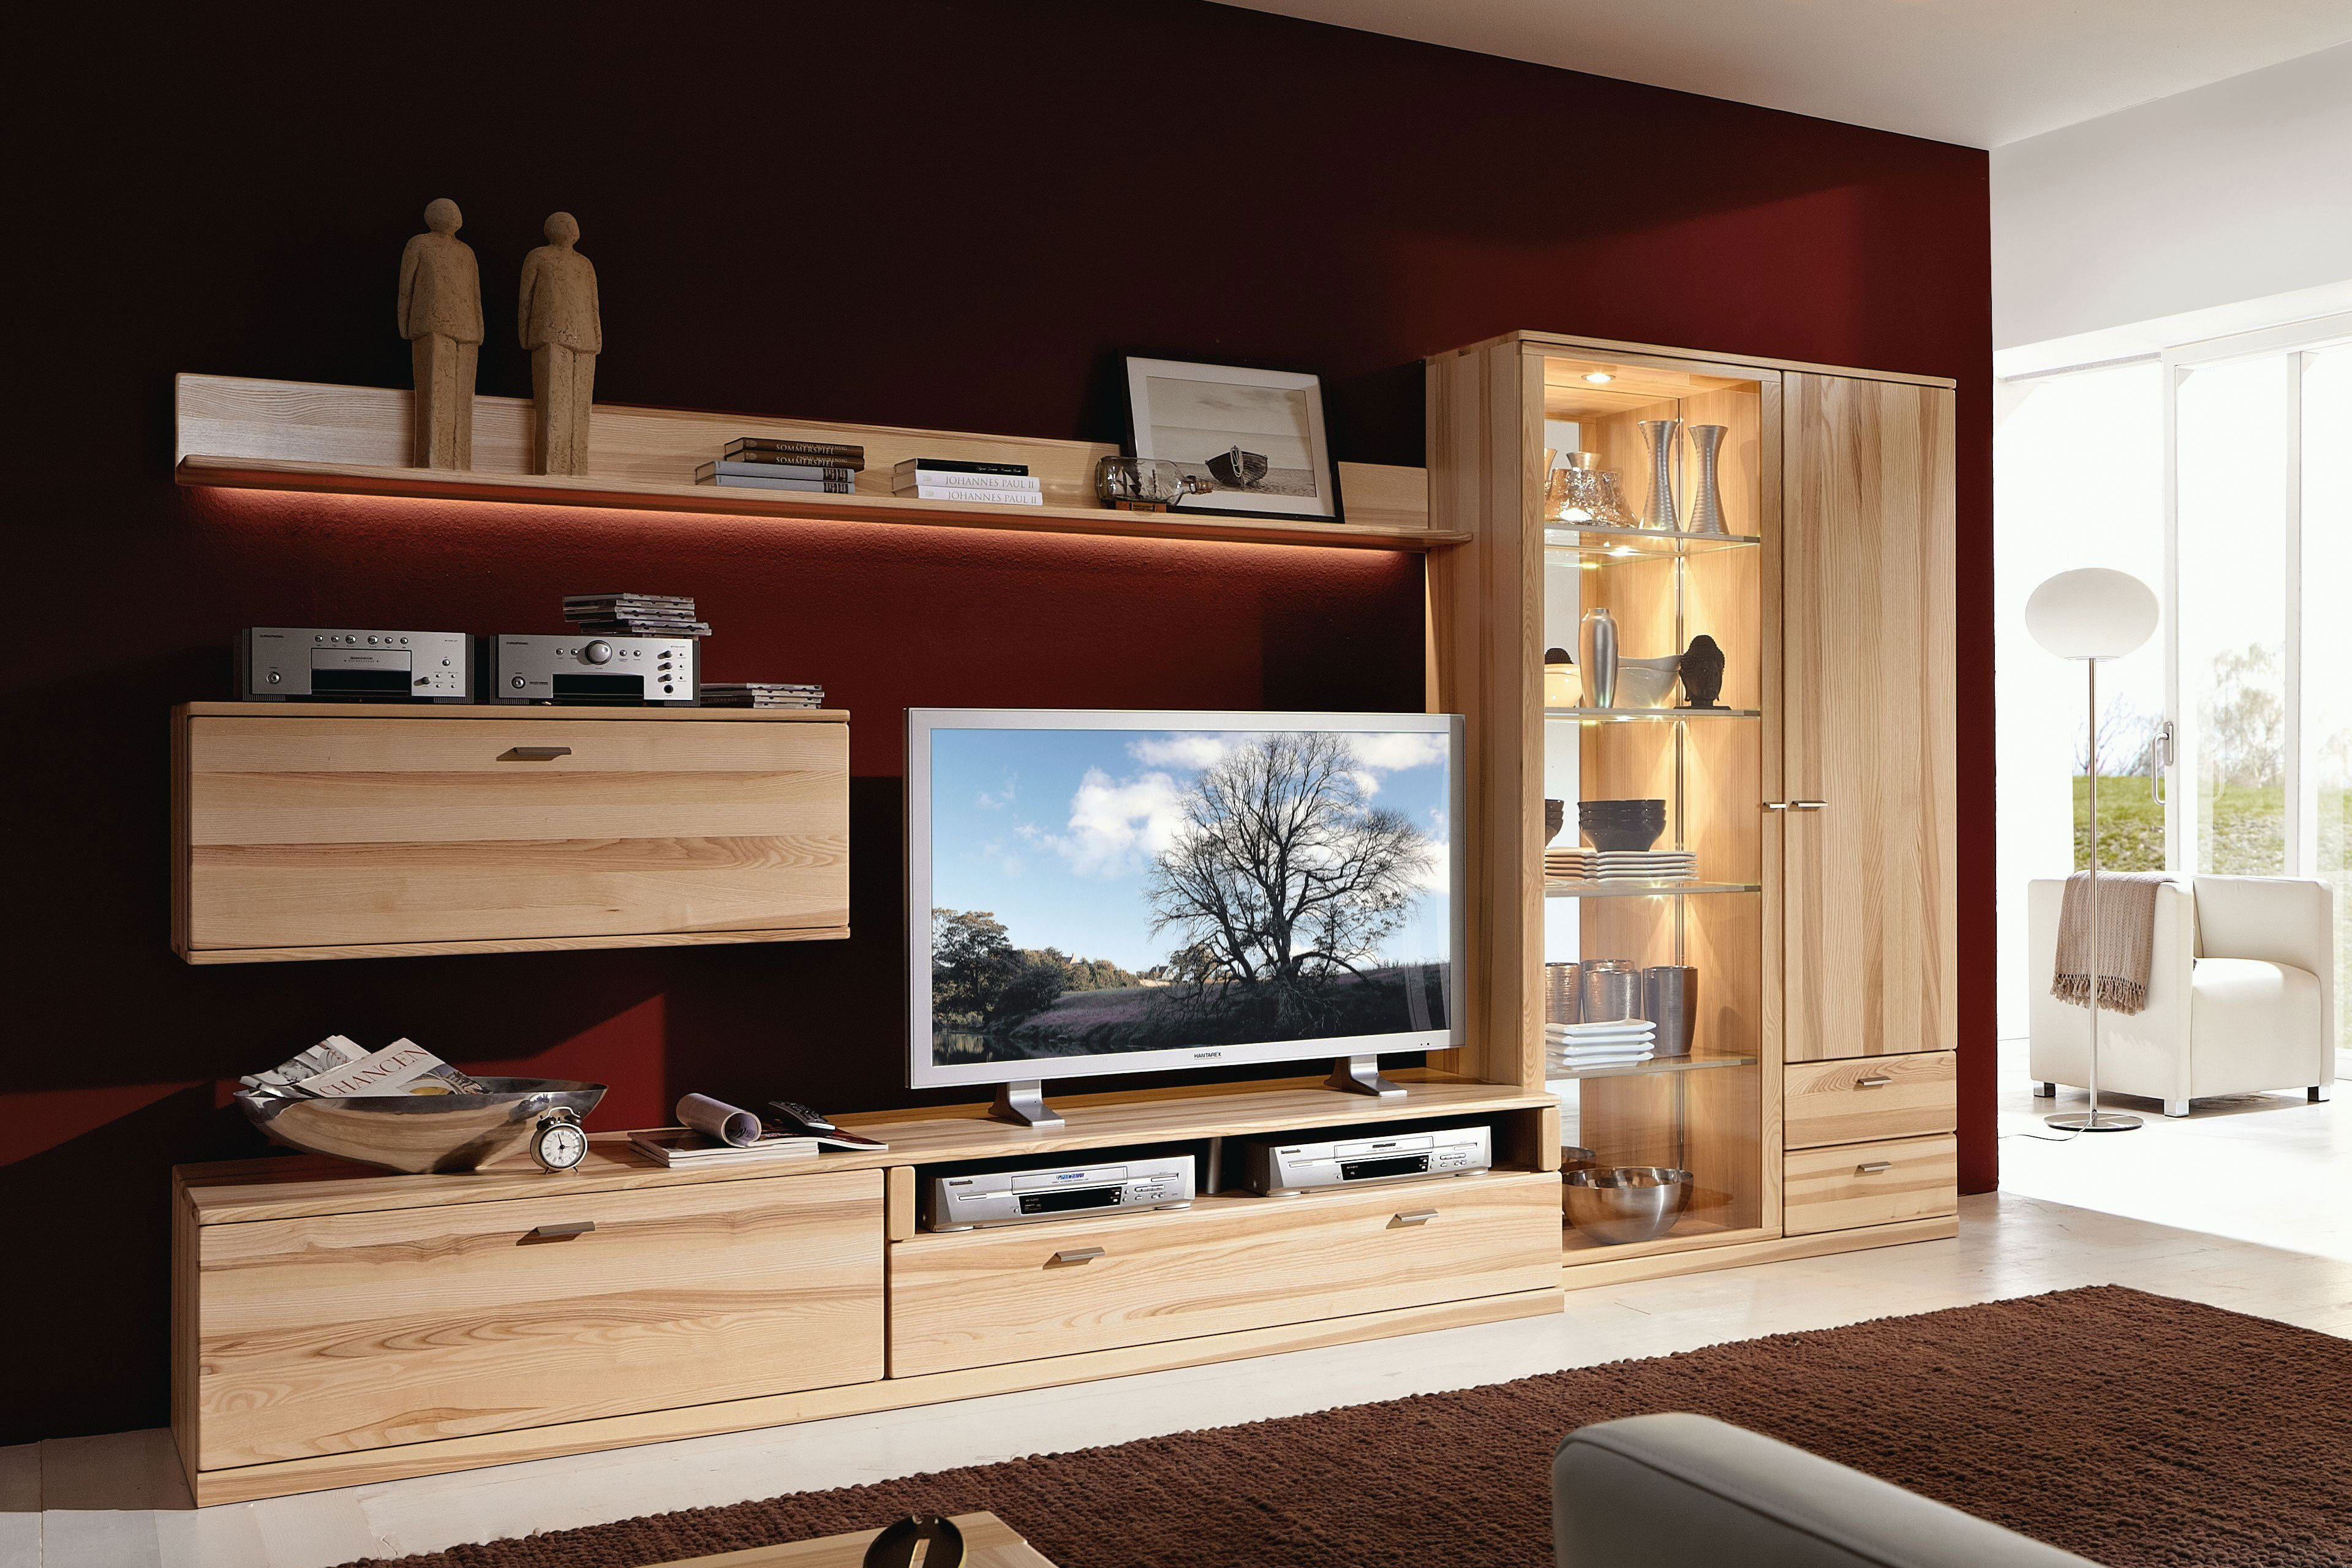 rietberger m belwerke wohnwand lyon 6779 kernesche m bel. Black Bedroom Furniture Sets. Home Design Ideas